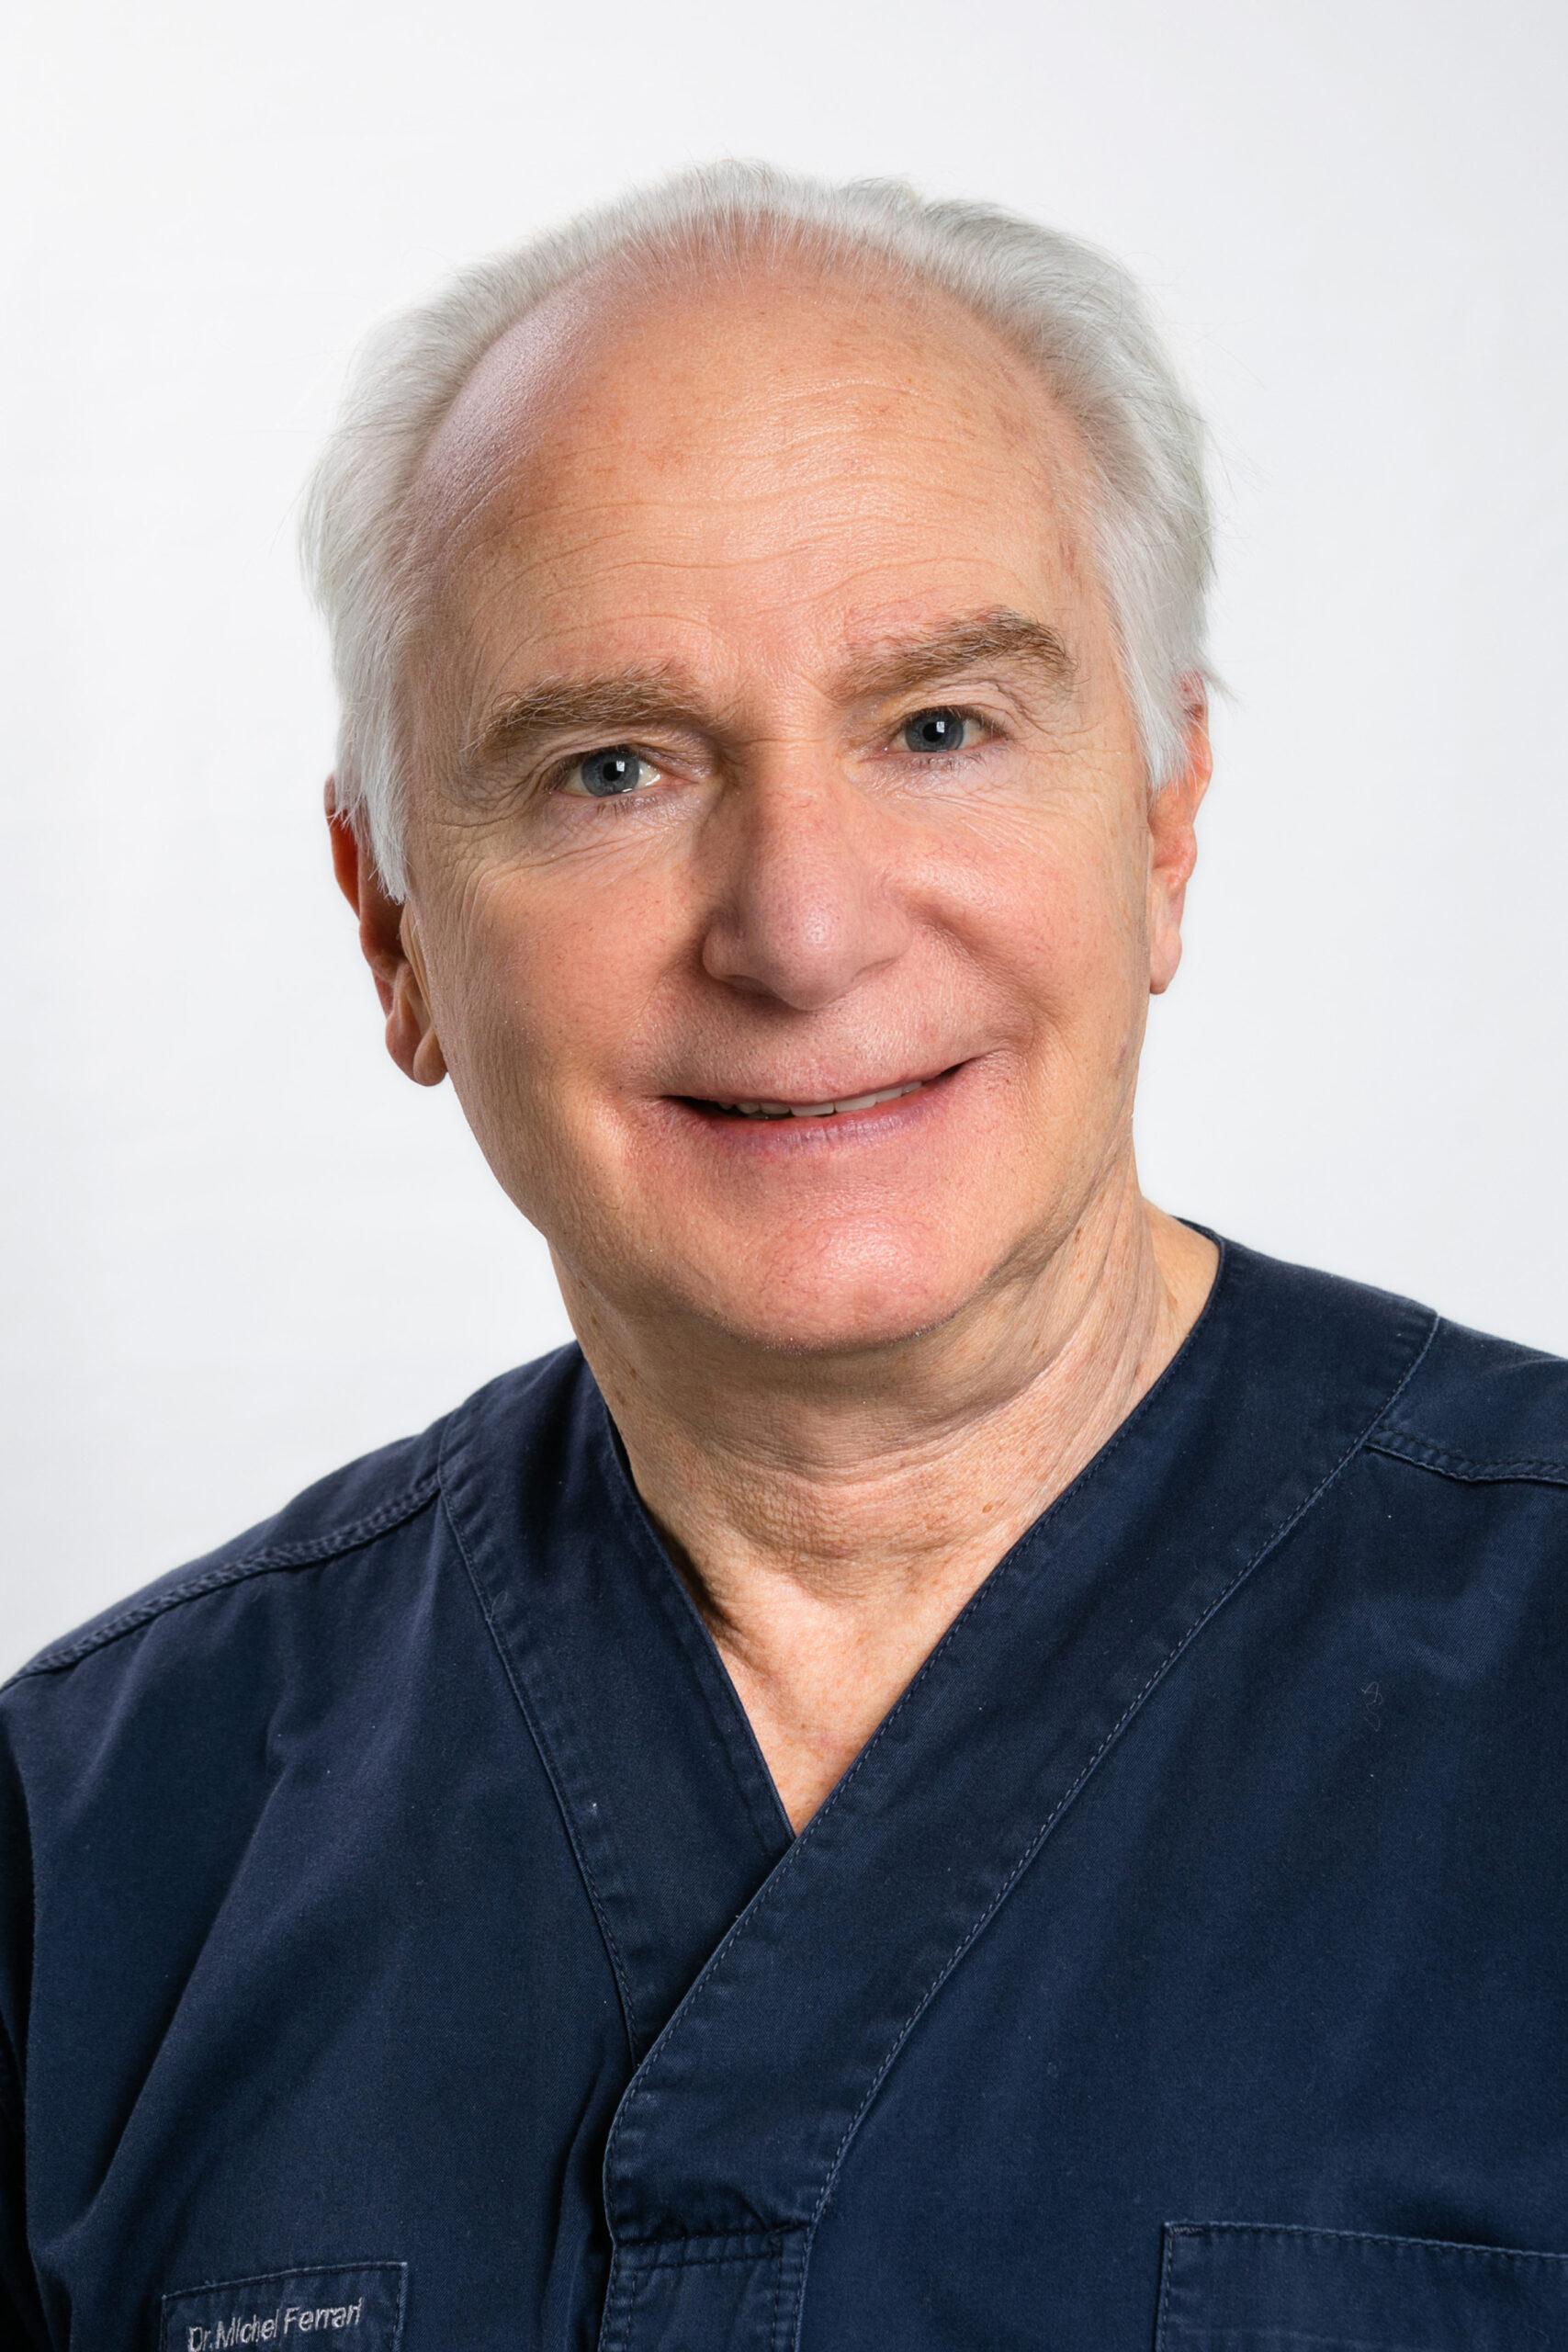 Dott. Michael Ferrari